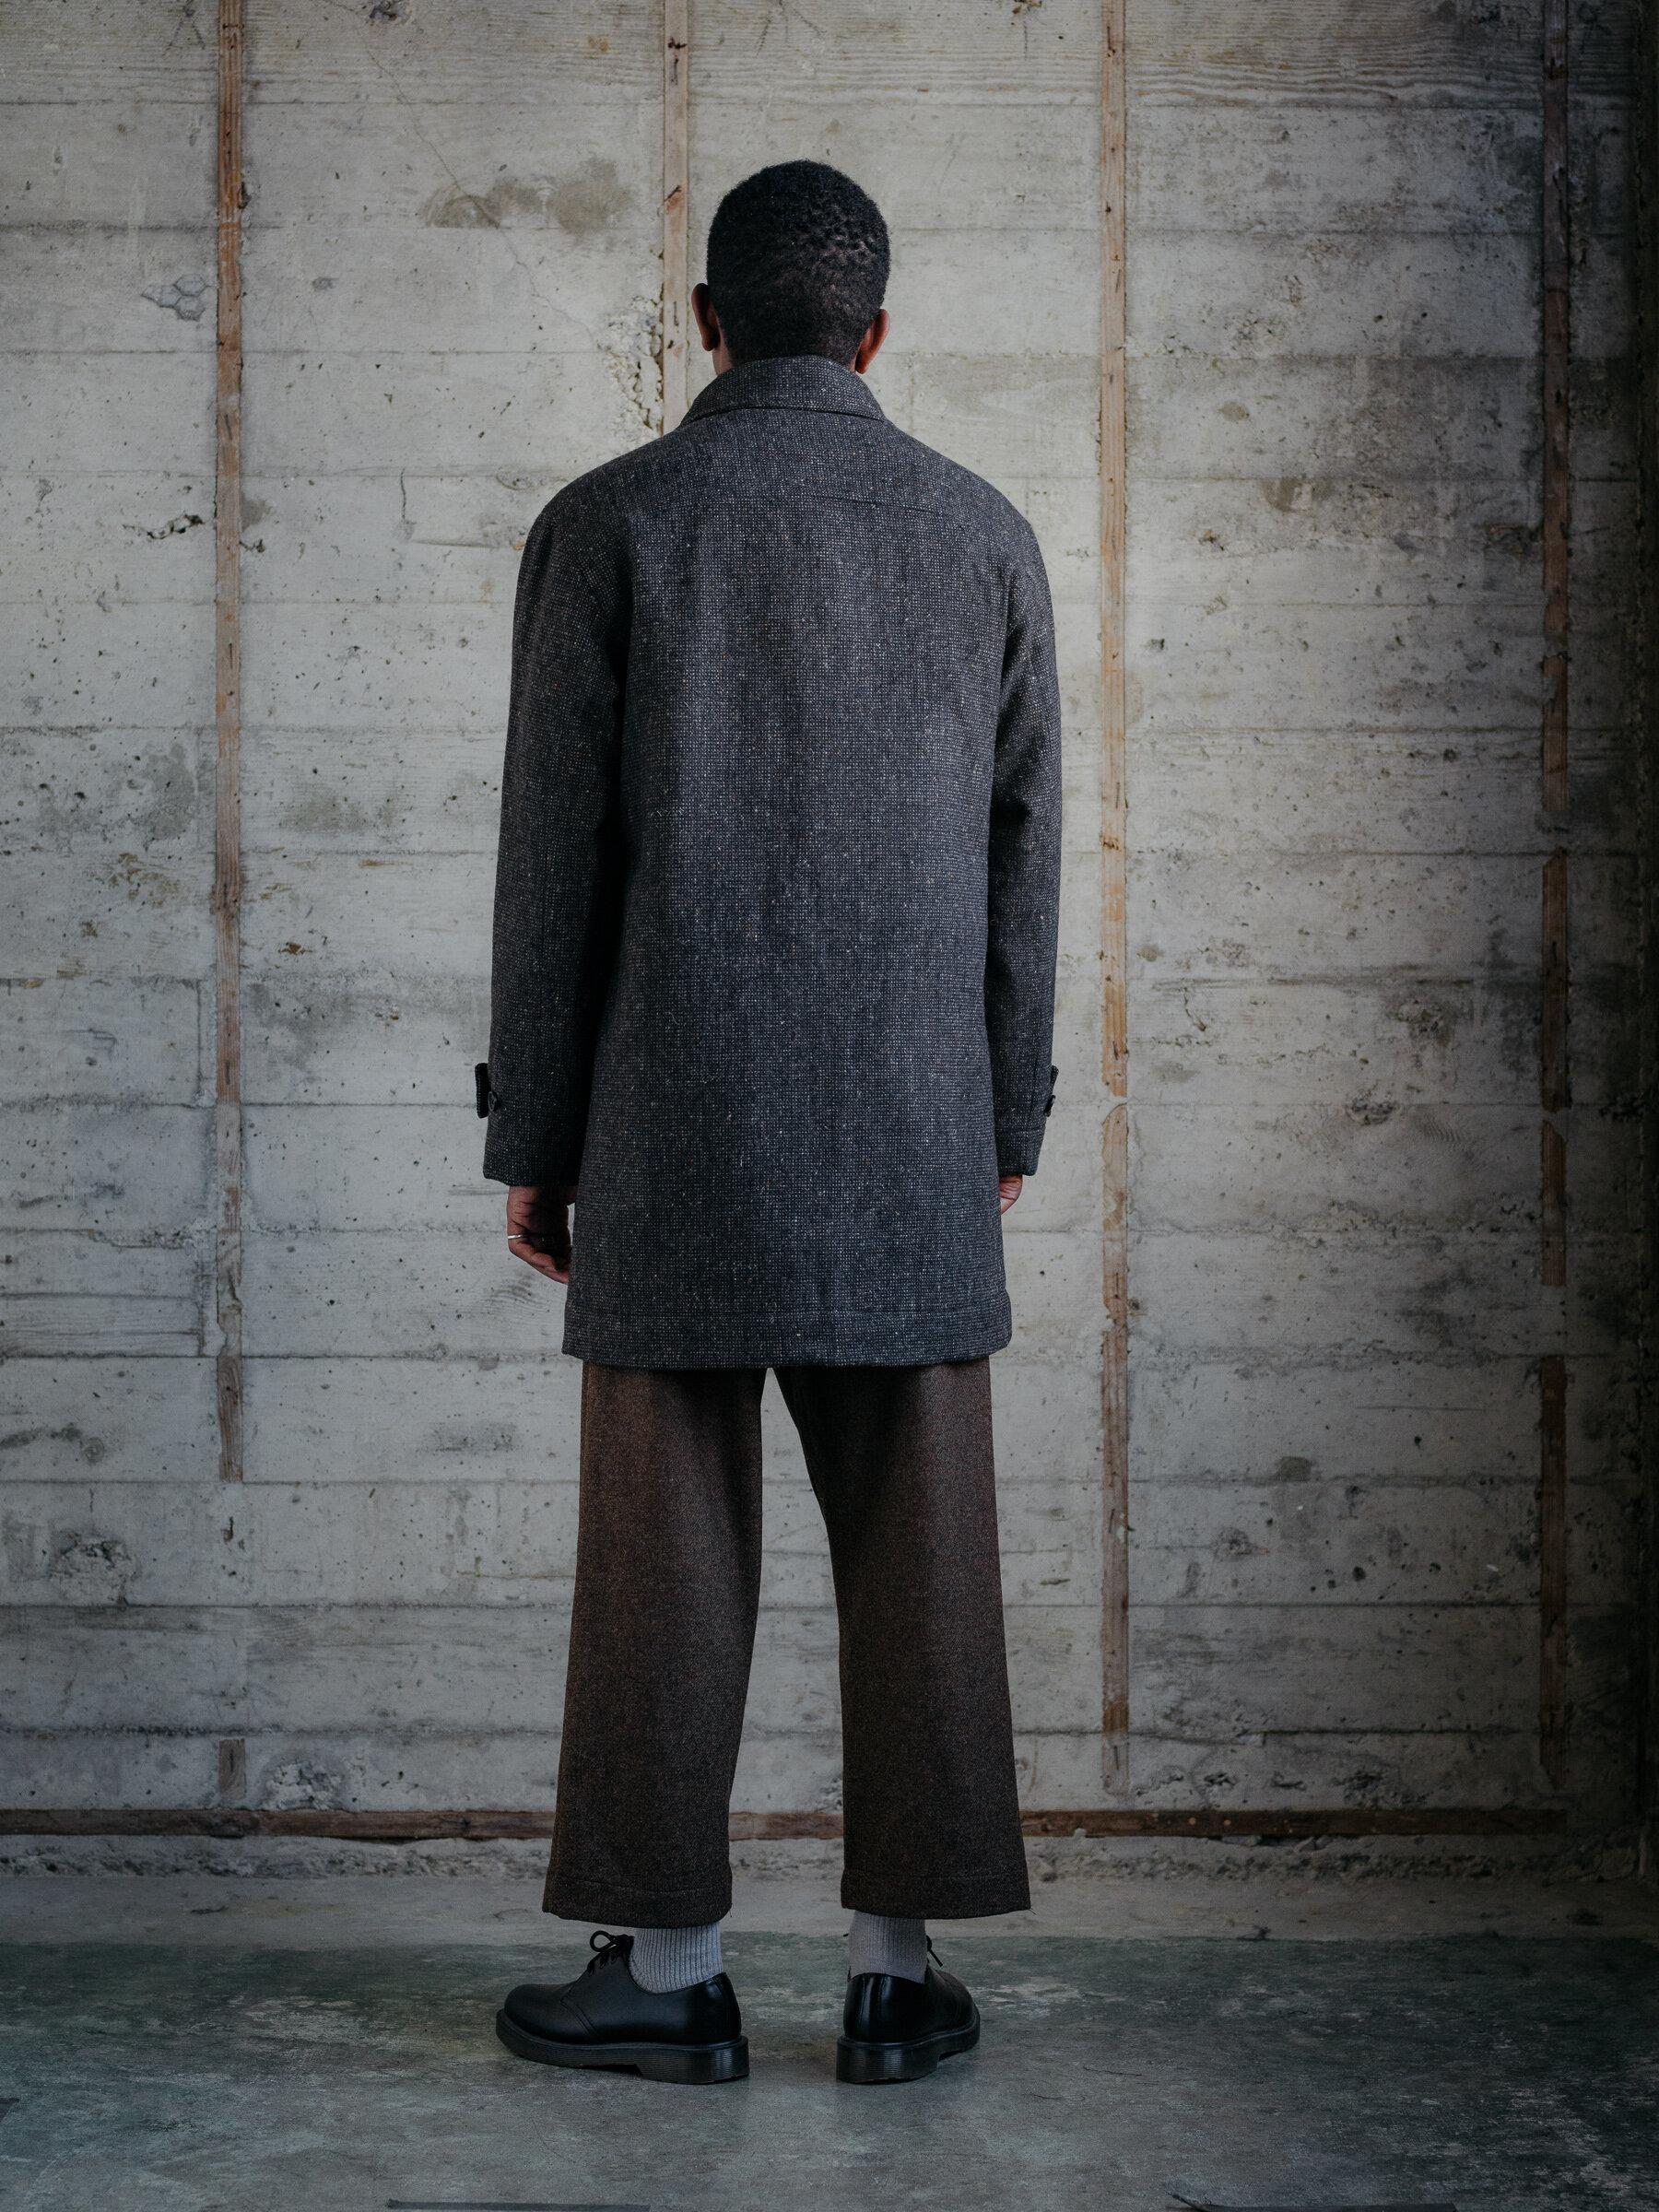 evan-kinori-covered-placket-coat-wool-tweed-woven-in-ireland-molloy-and-sons-3